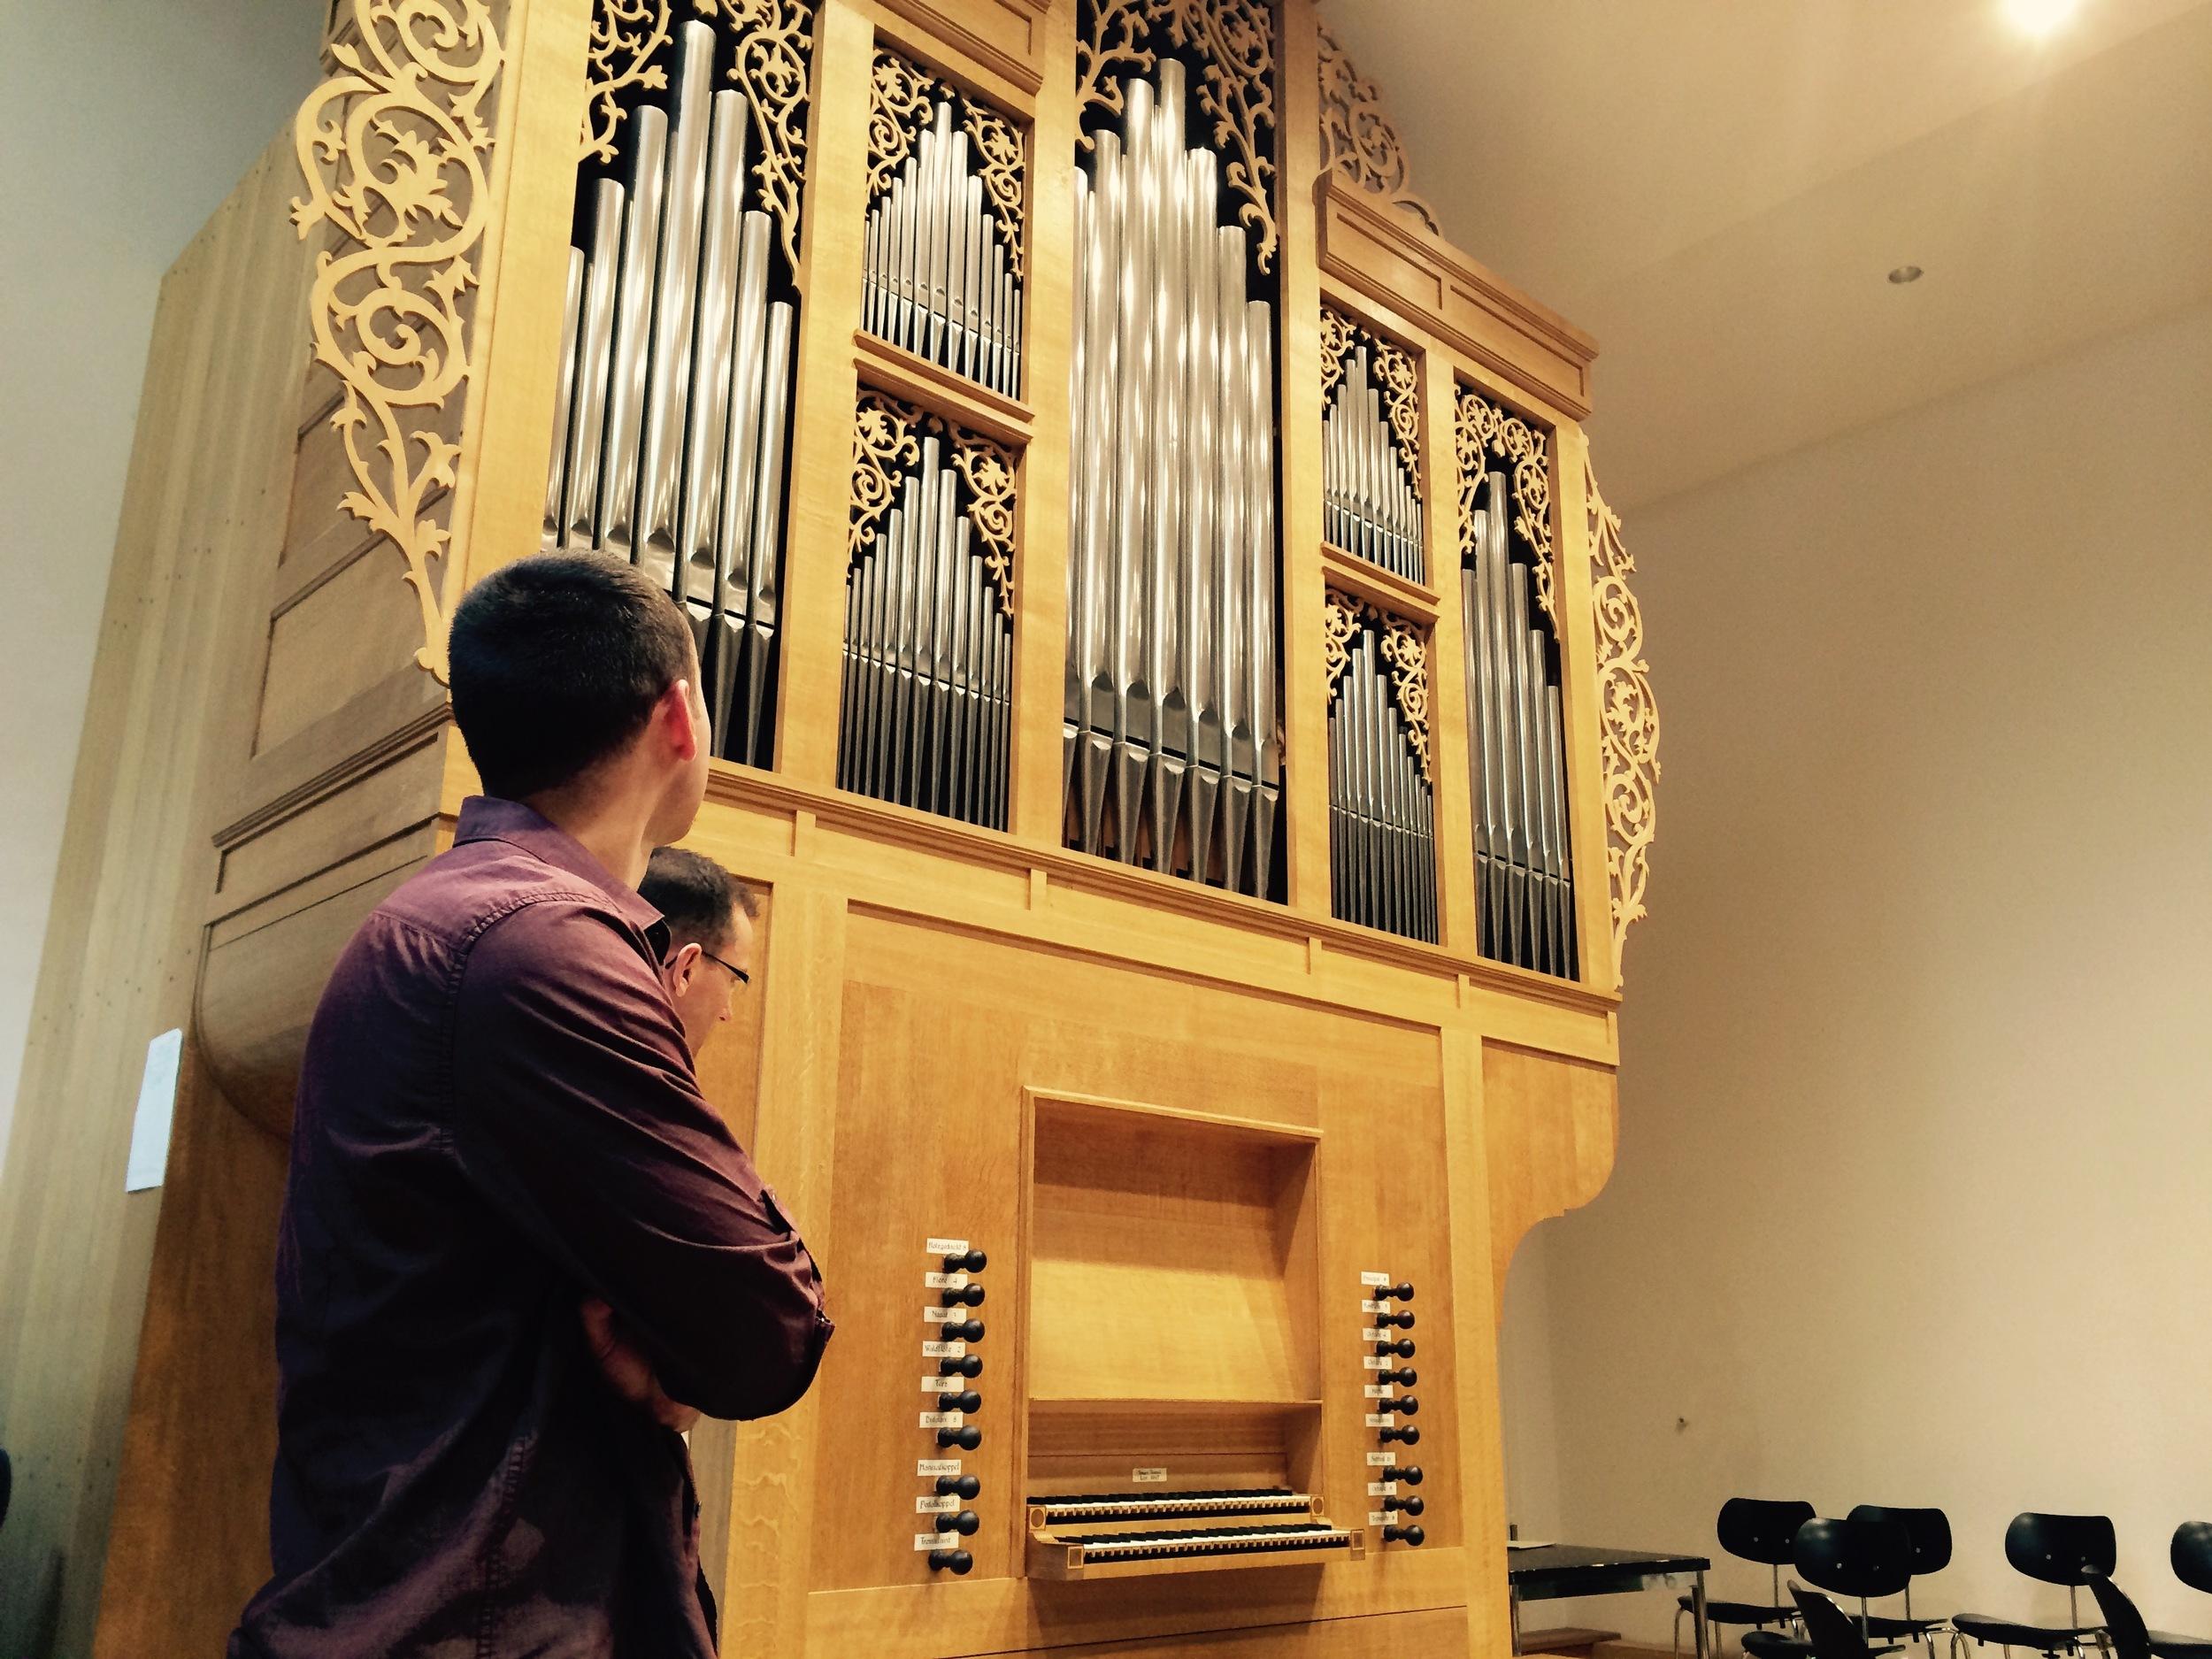 Kade admires the North German-style organ